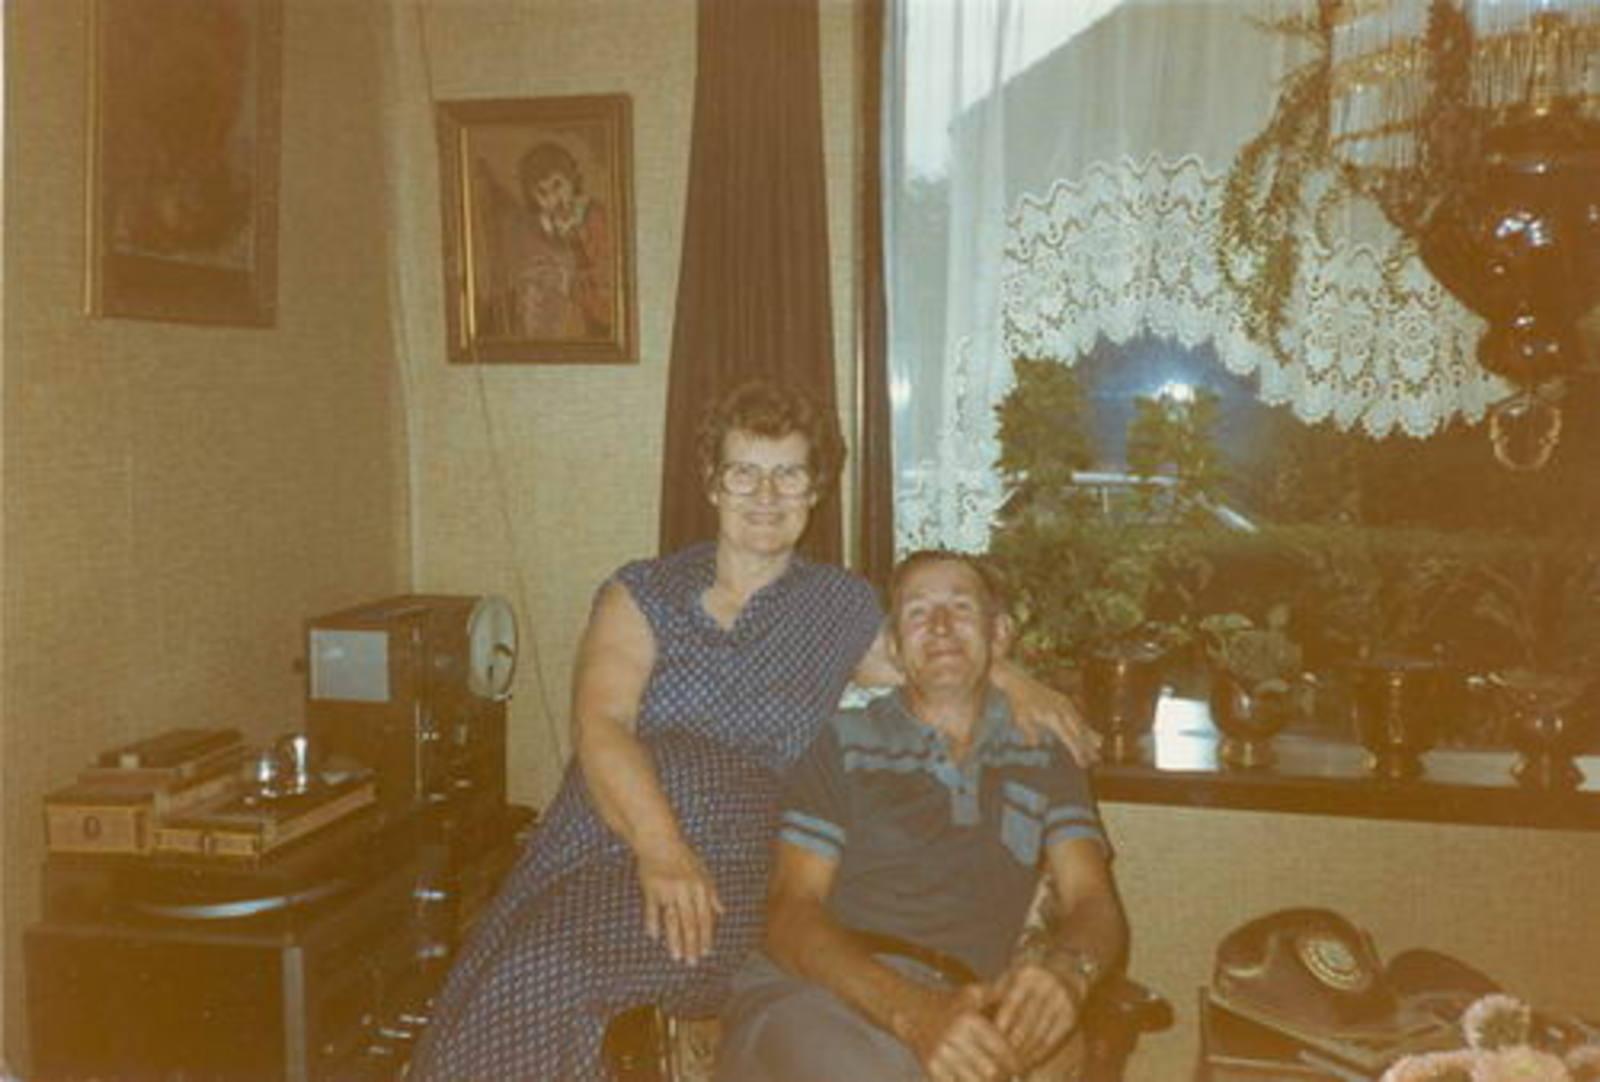 Imanse Iman C 1920 1983 binnen met vrouw  Leentje Bliek